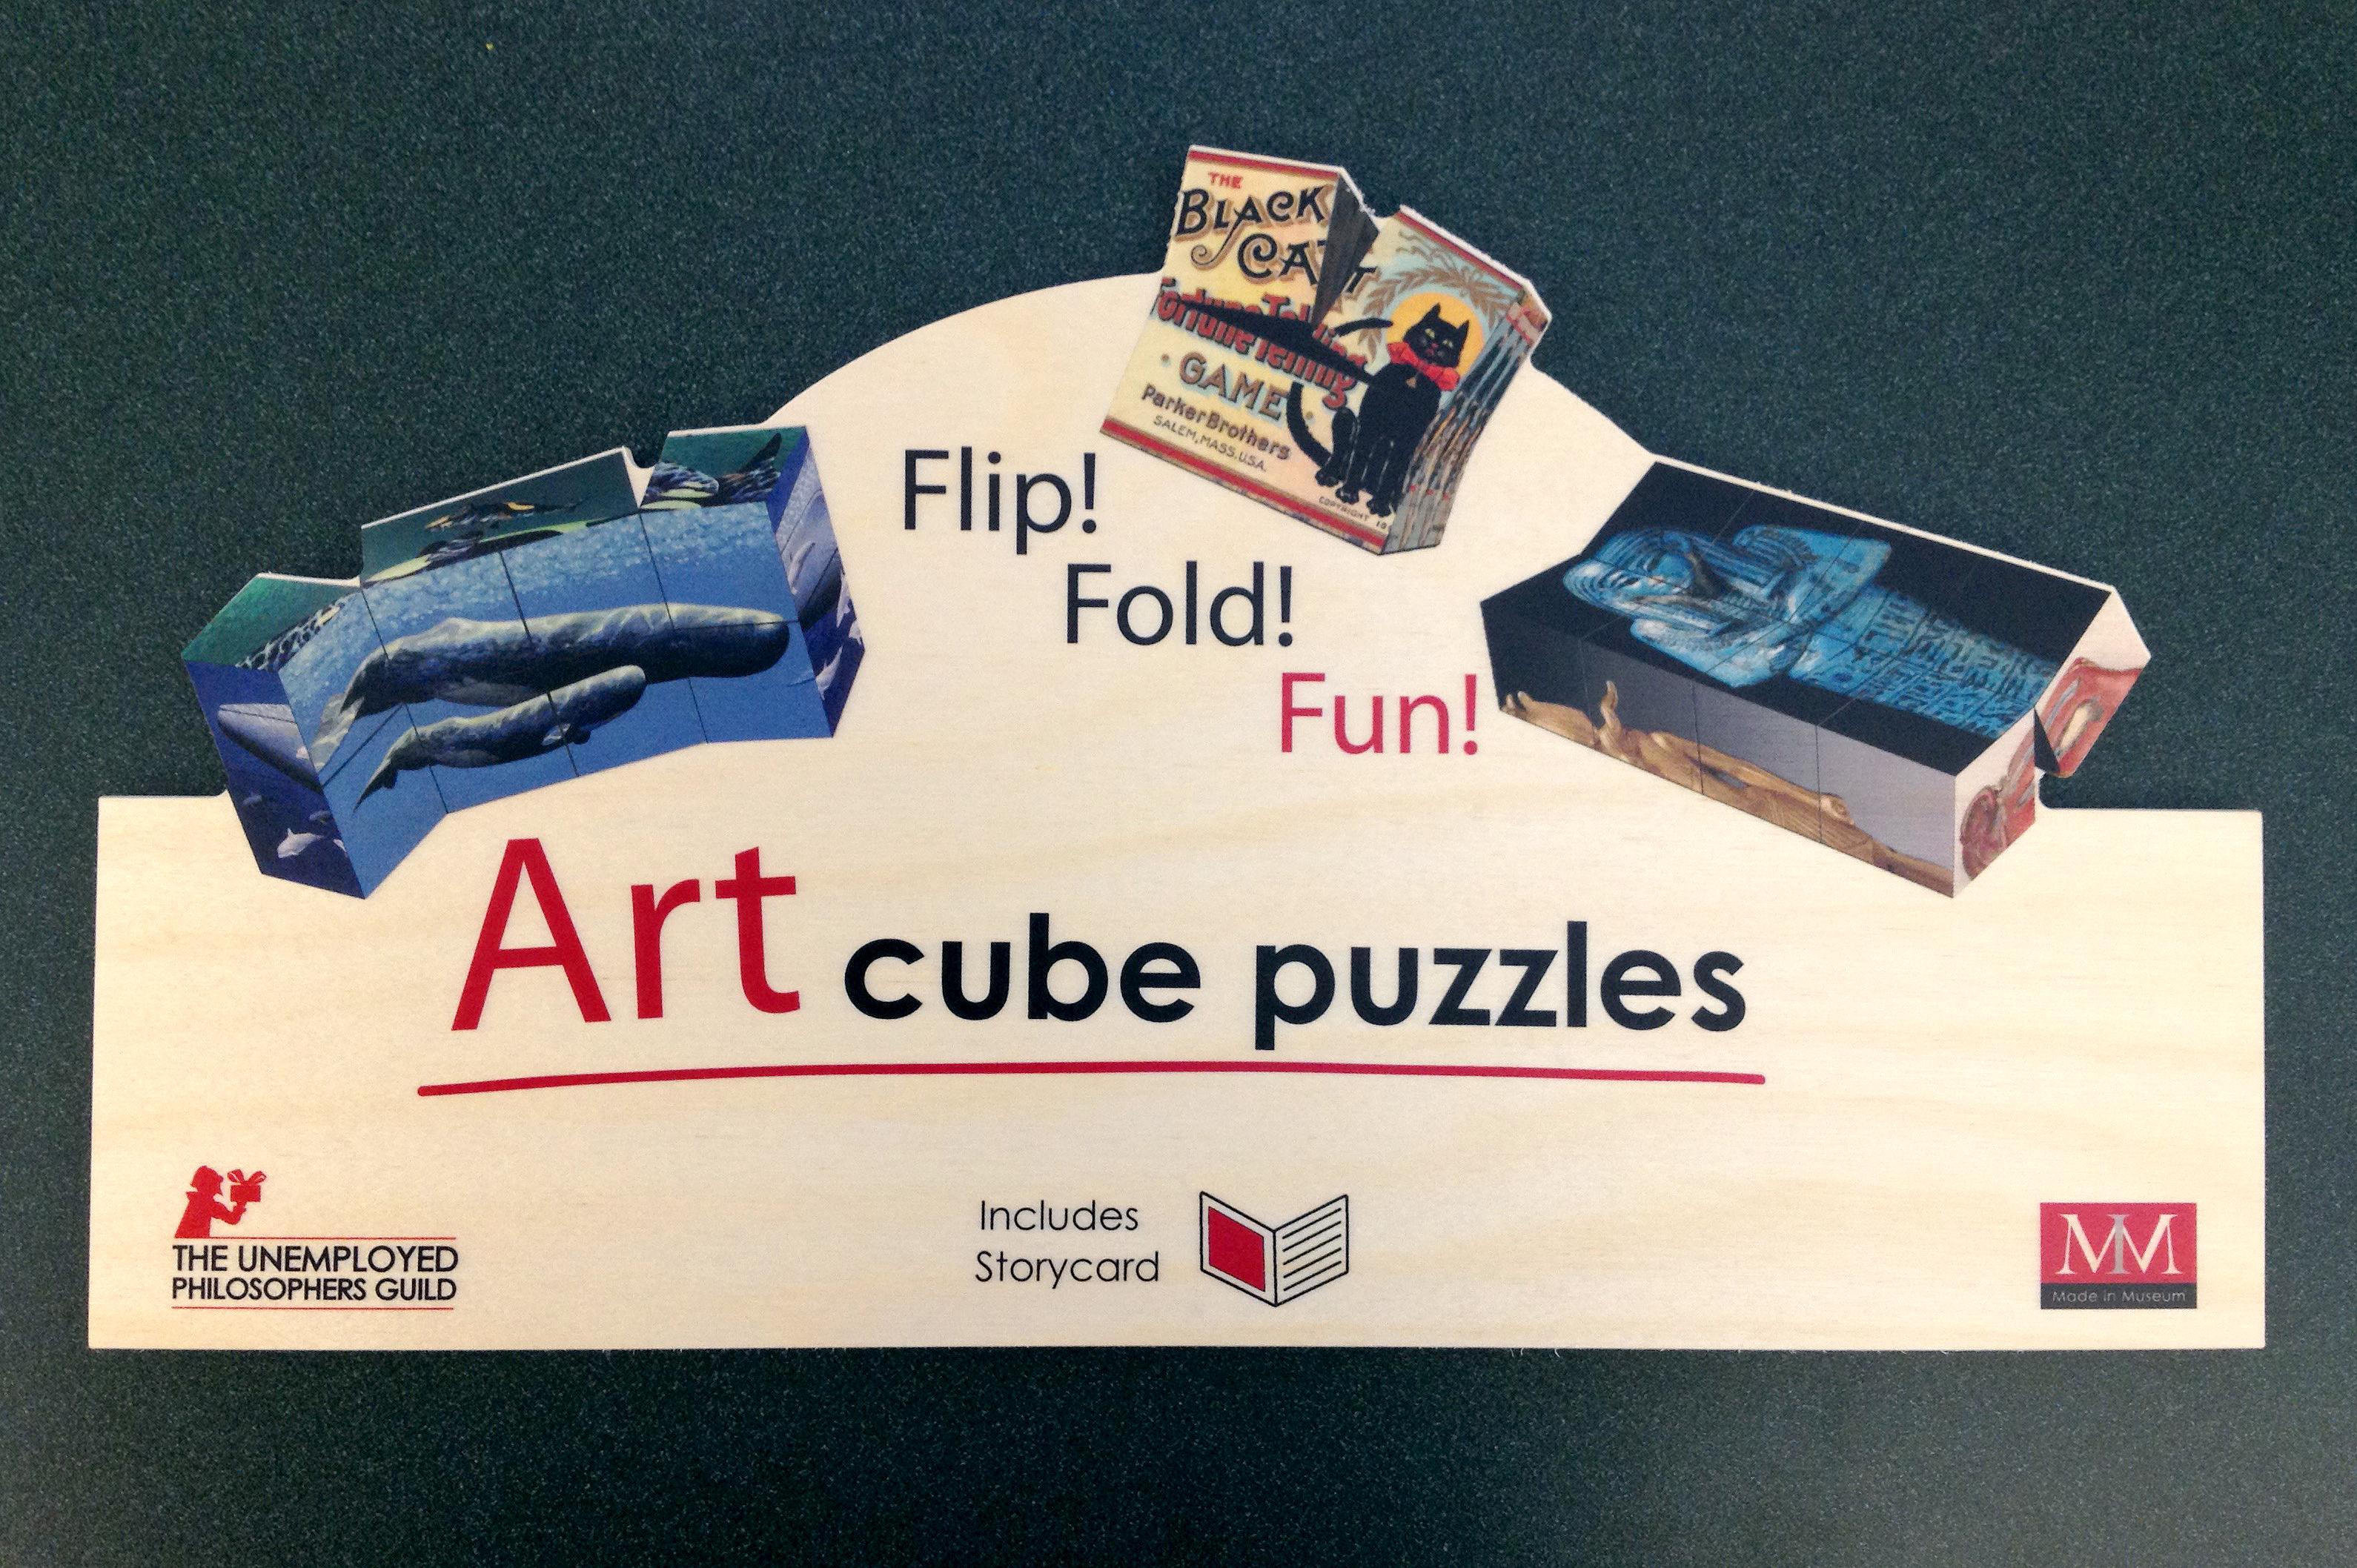 art-cube-puzz.jpg